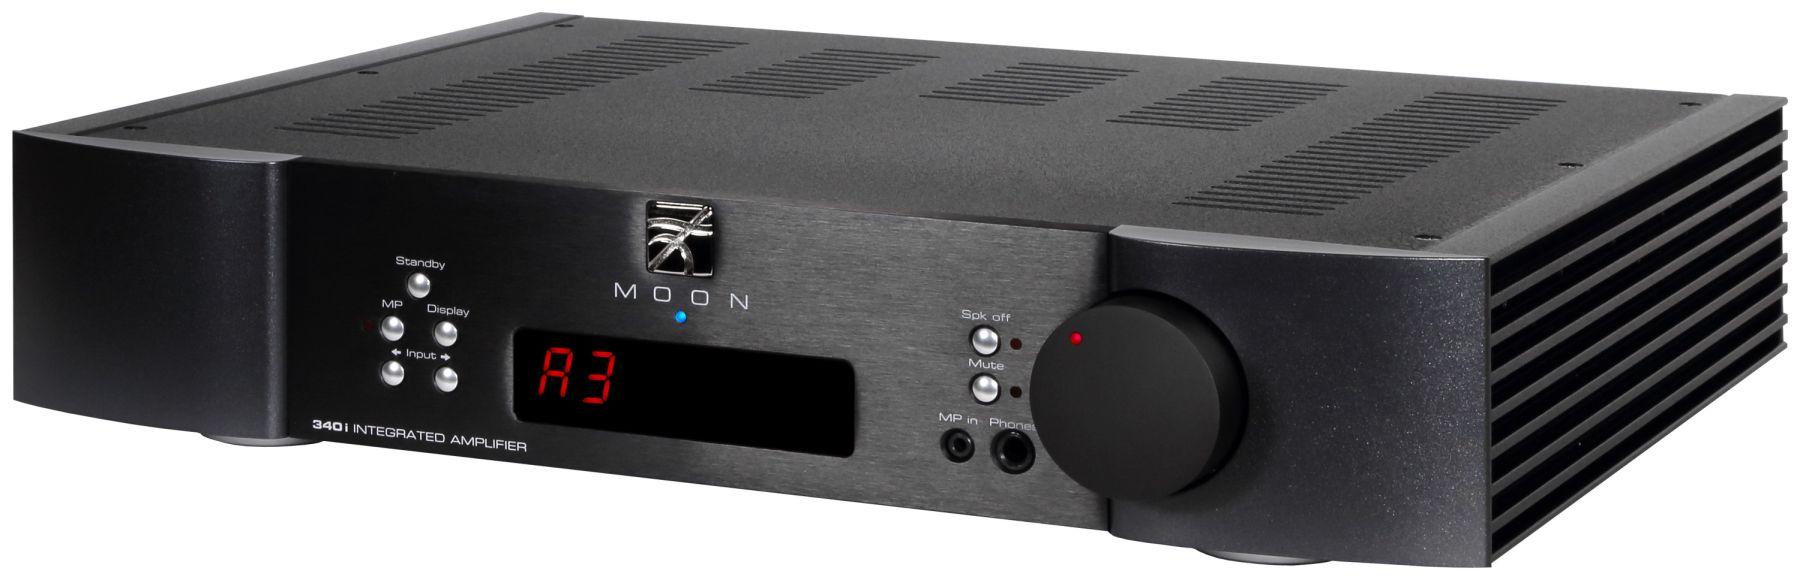 Стереоусилитель SIM Audio Moon Neo 340i D3PX black